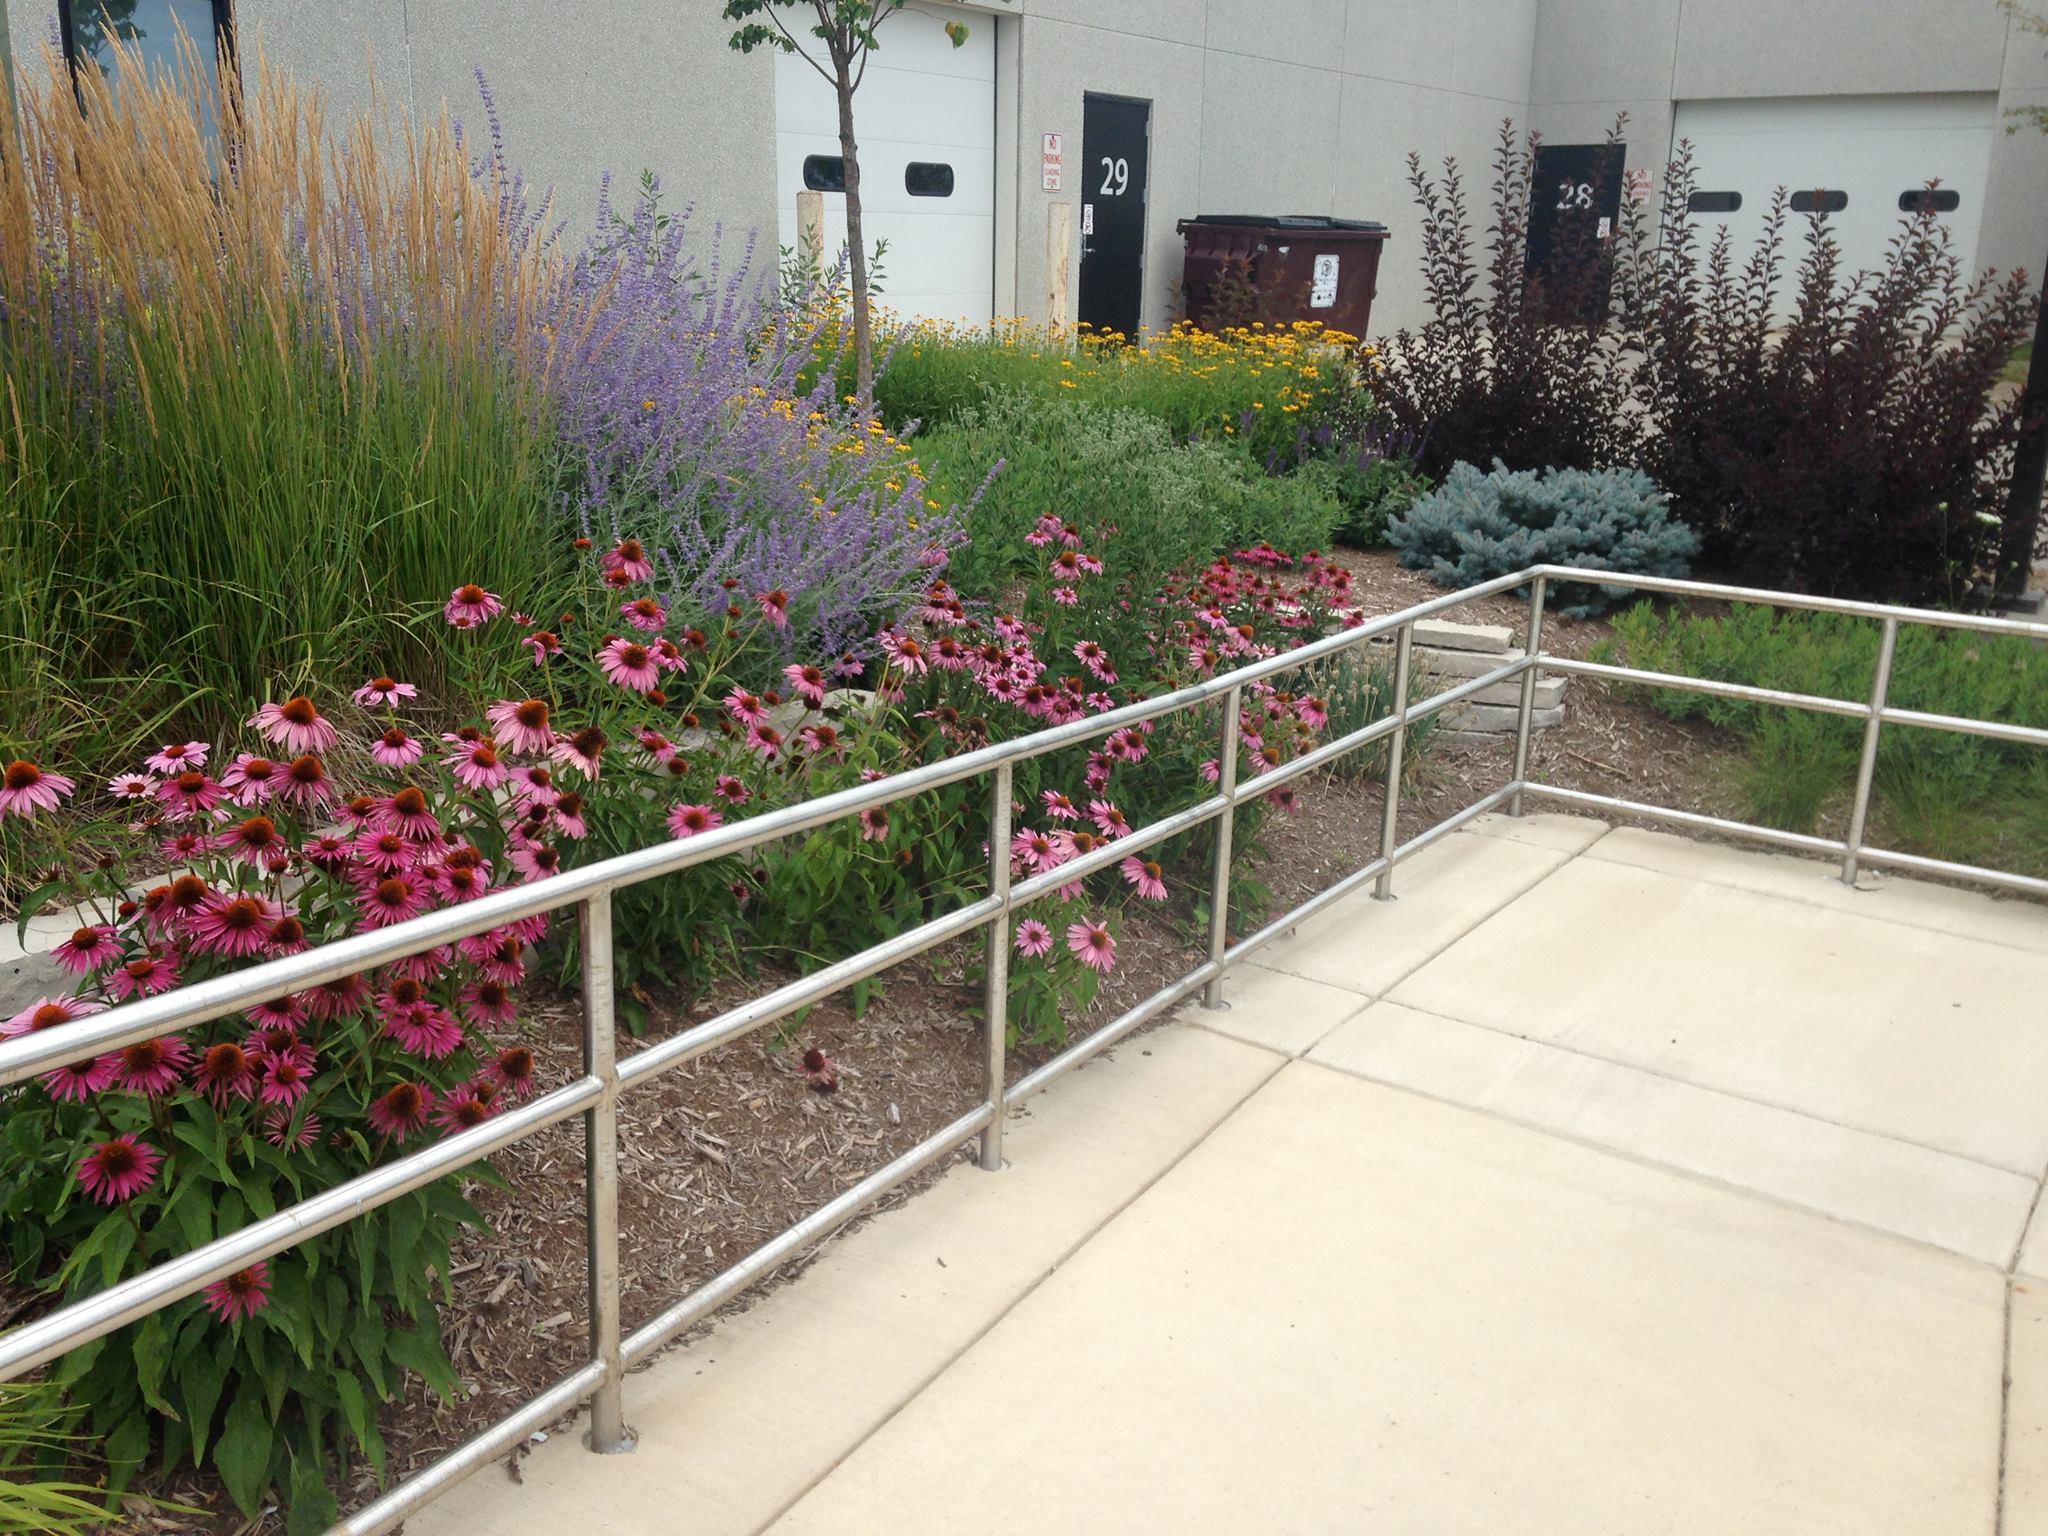 Commercial and Institutional Landscape Design